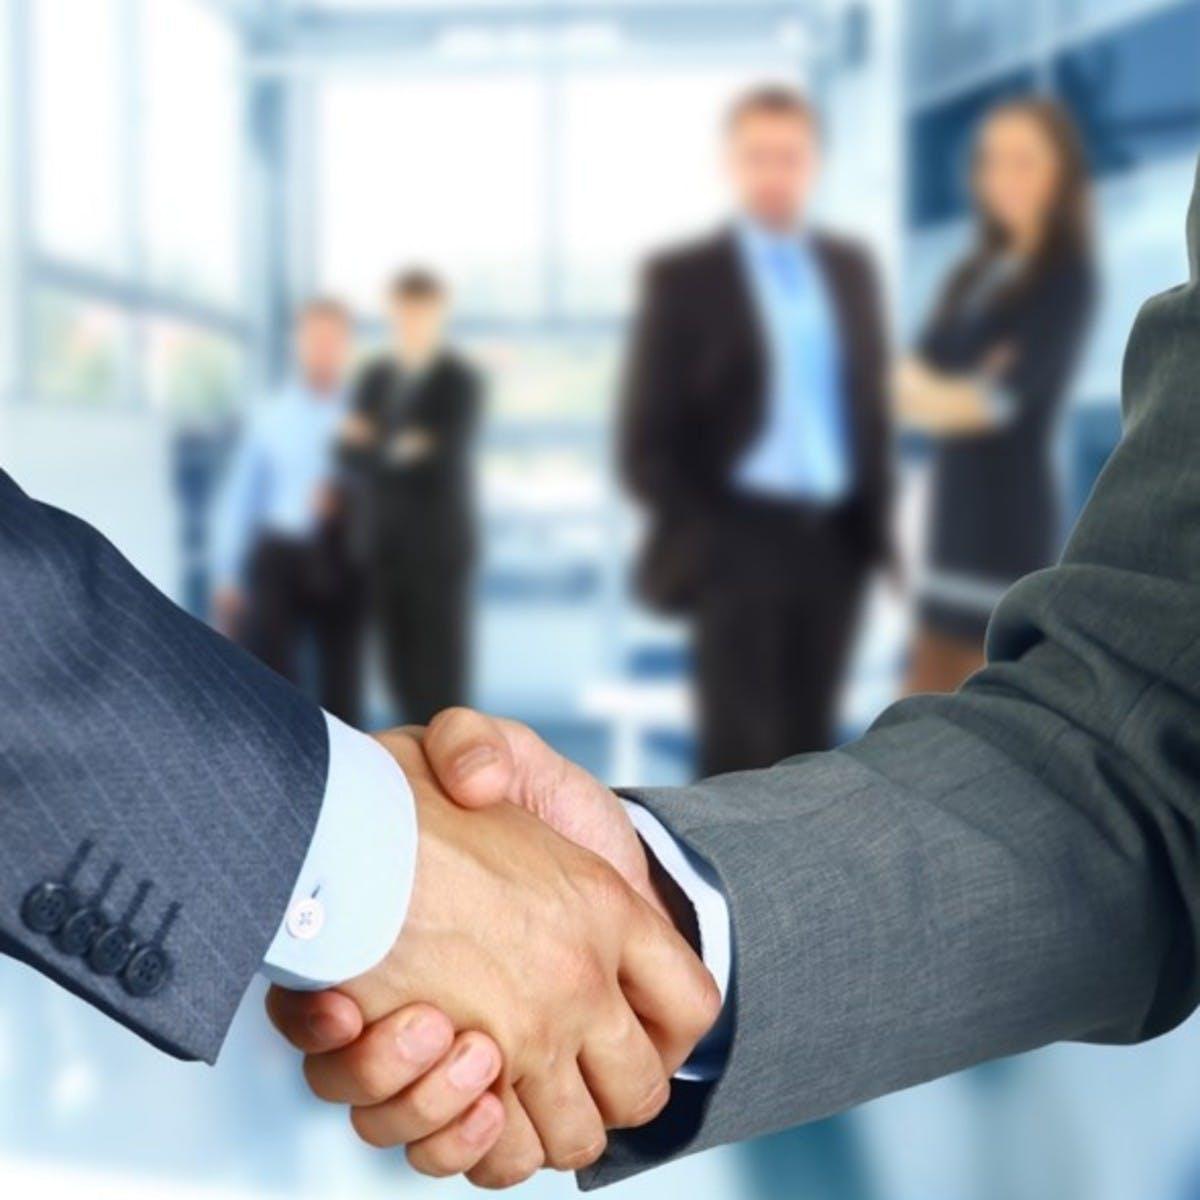 商务英语课程:管理与领导力英语 Management & Leadership